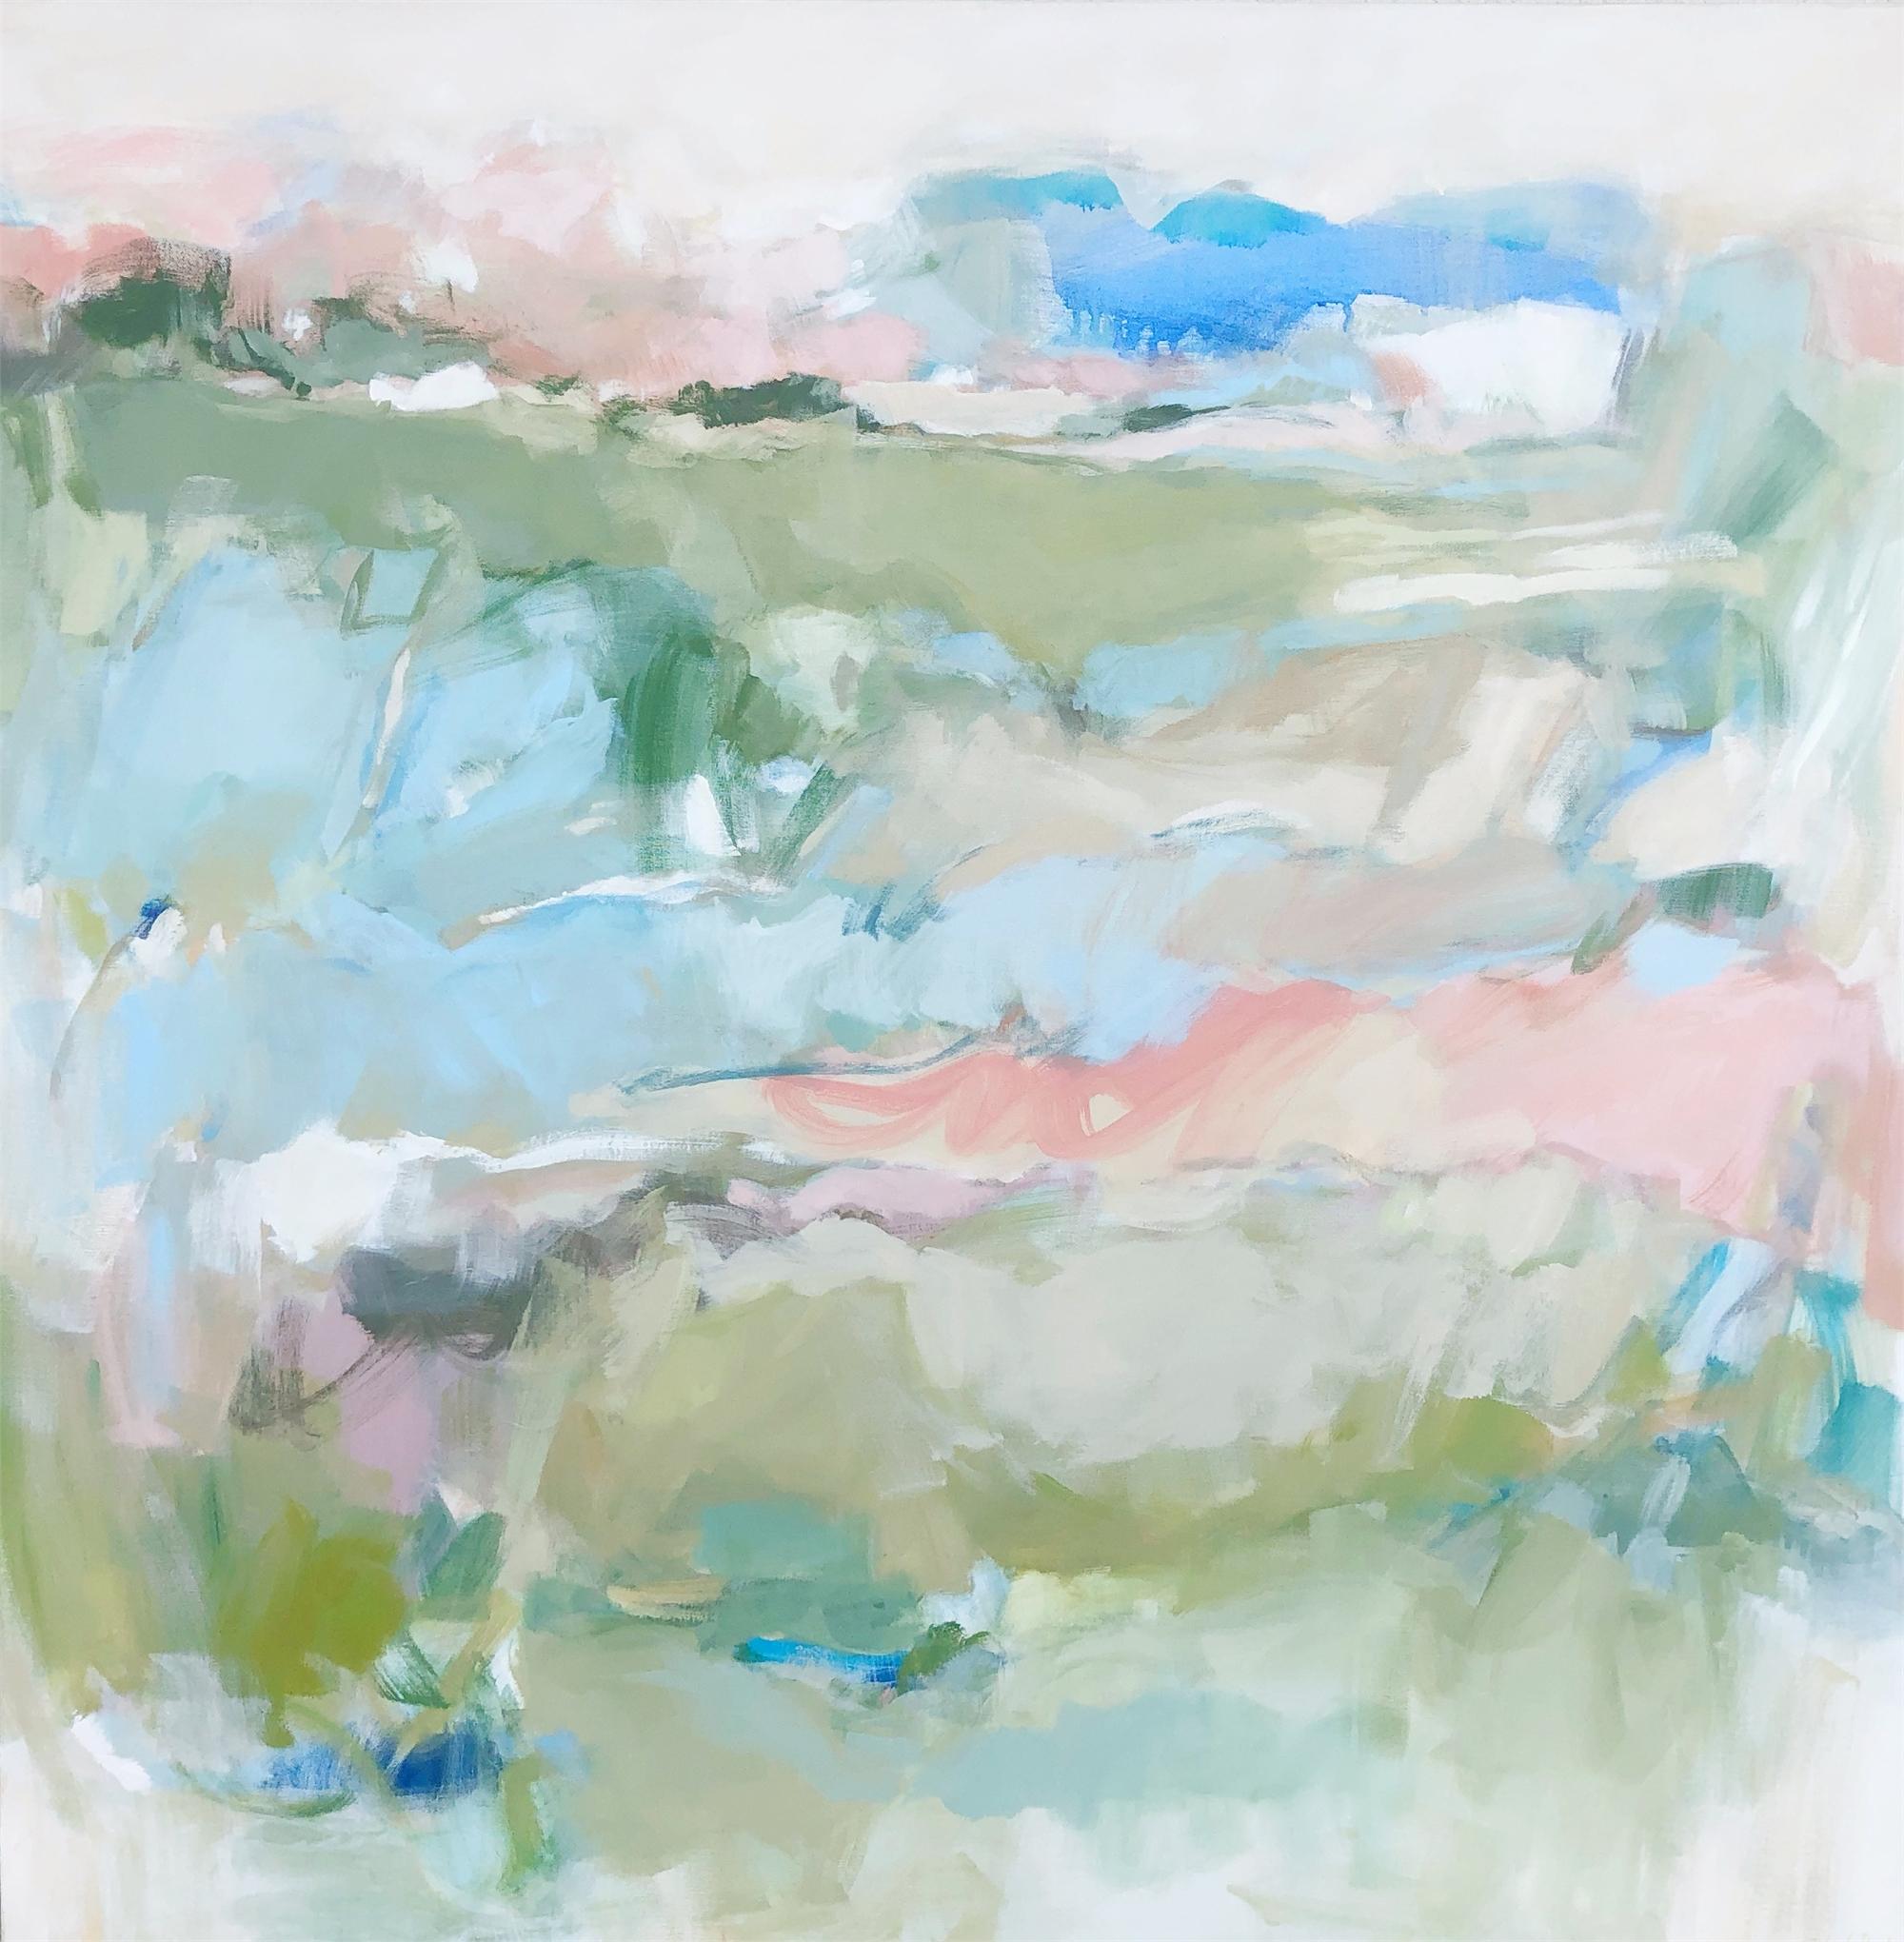 Spring Break by Christina Baker